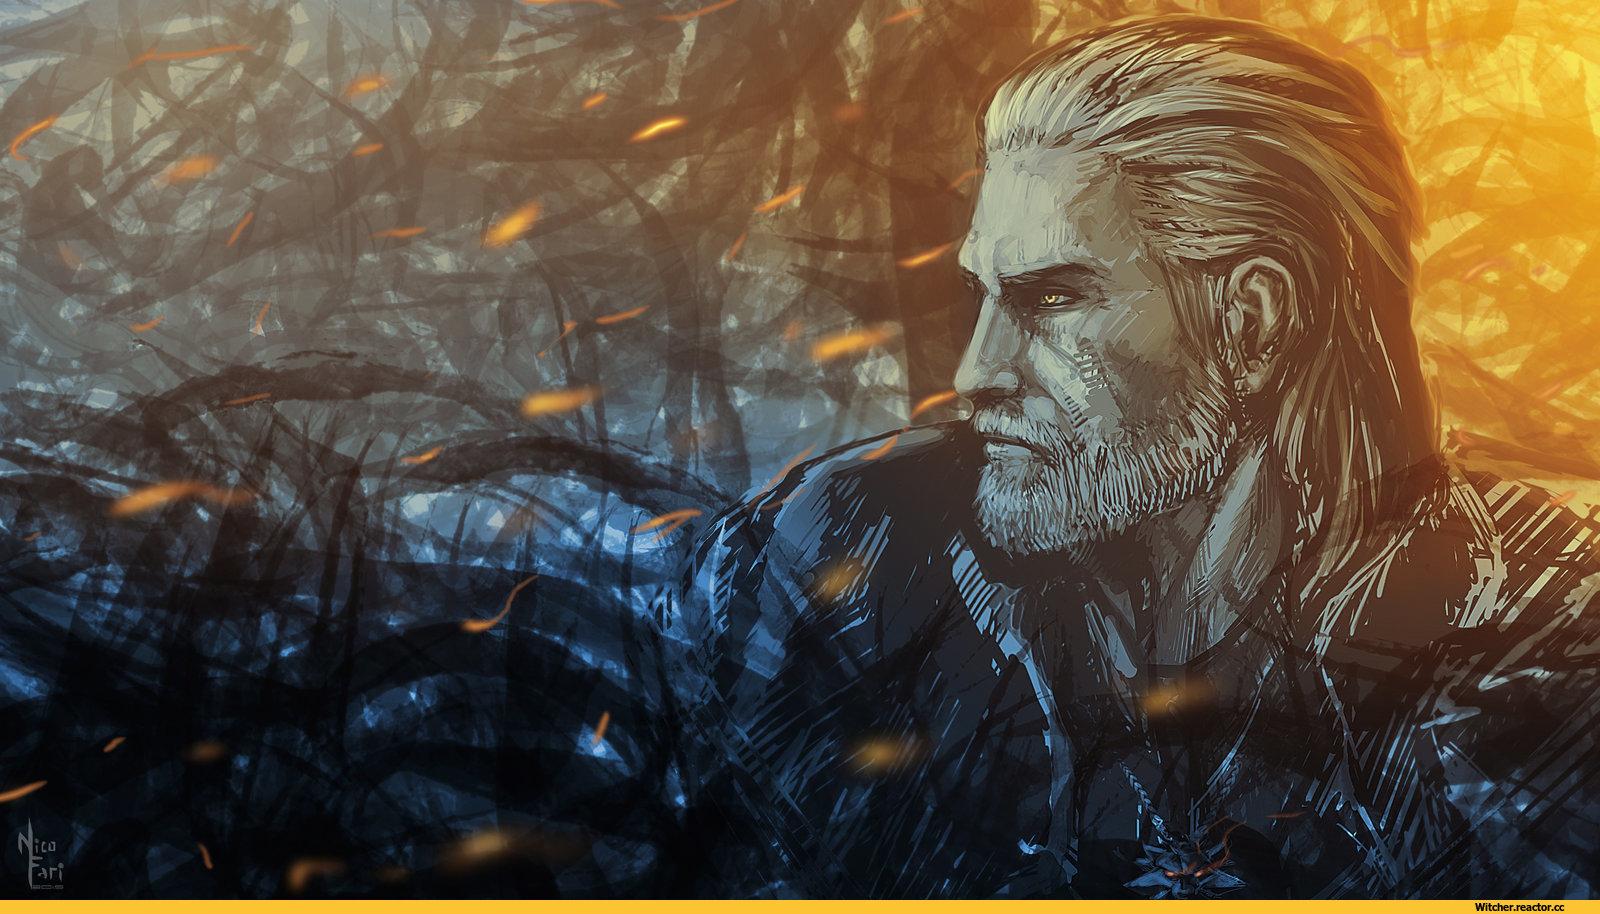 Геральт, Арт - Witcher 3: Wild Hunt, the Арт